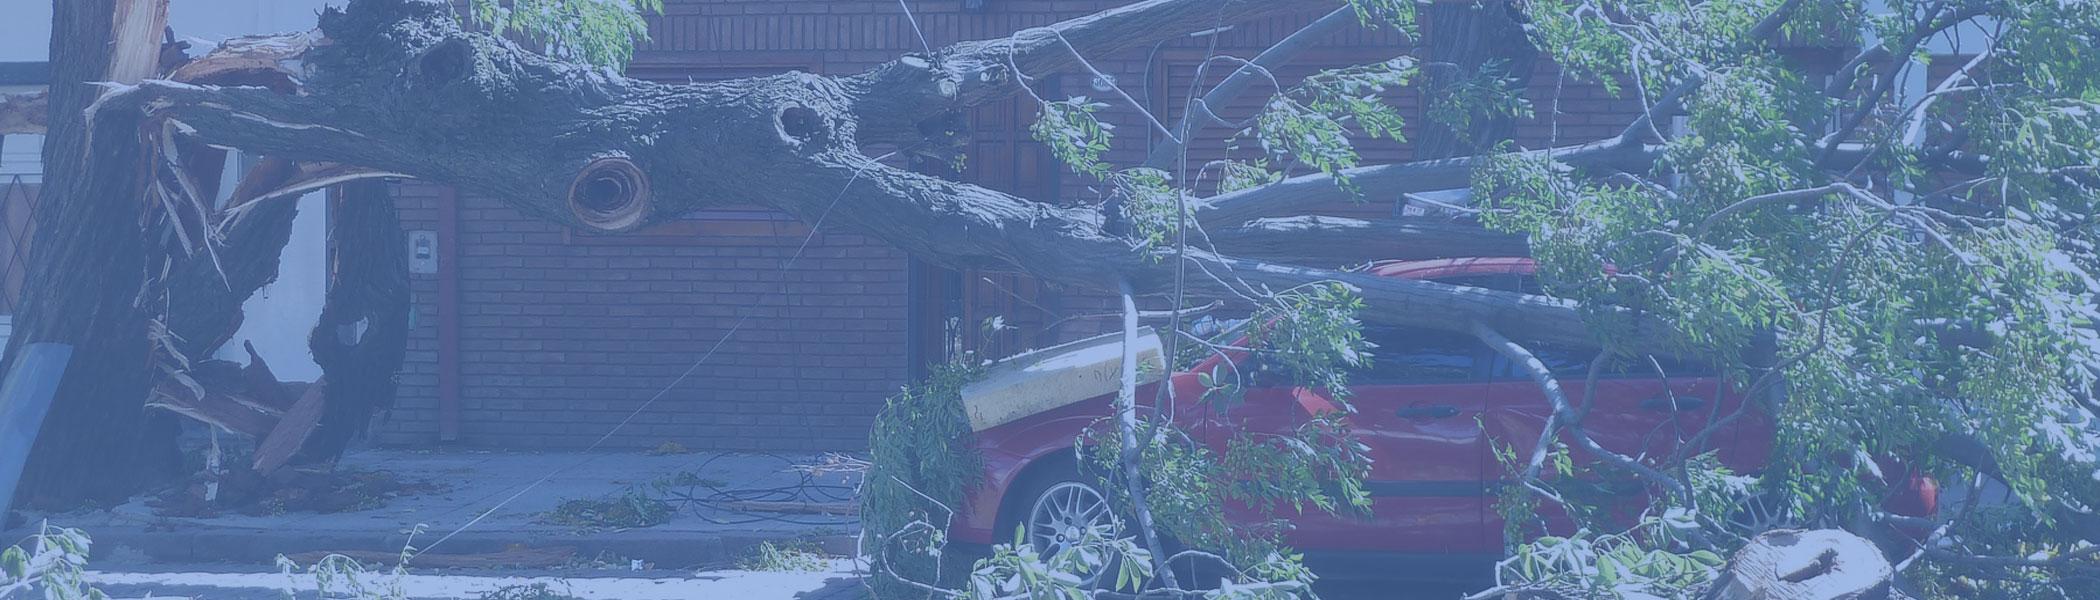 car crushed by tree limb